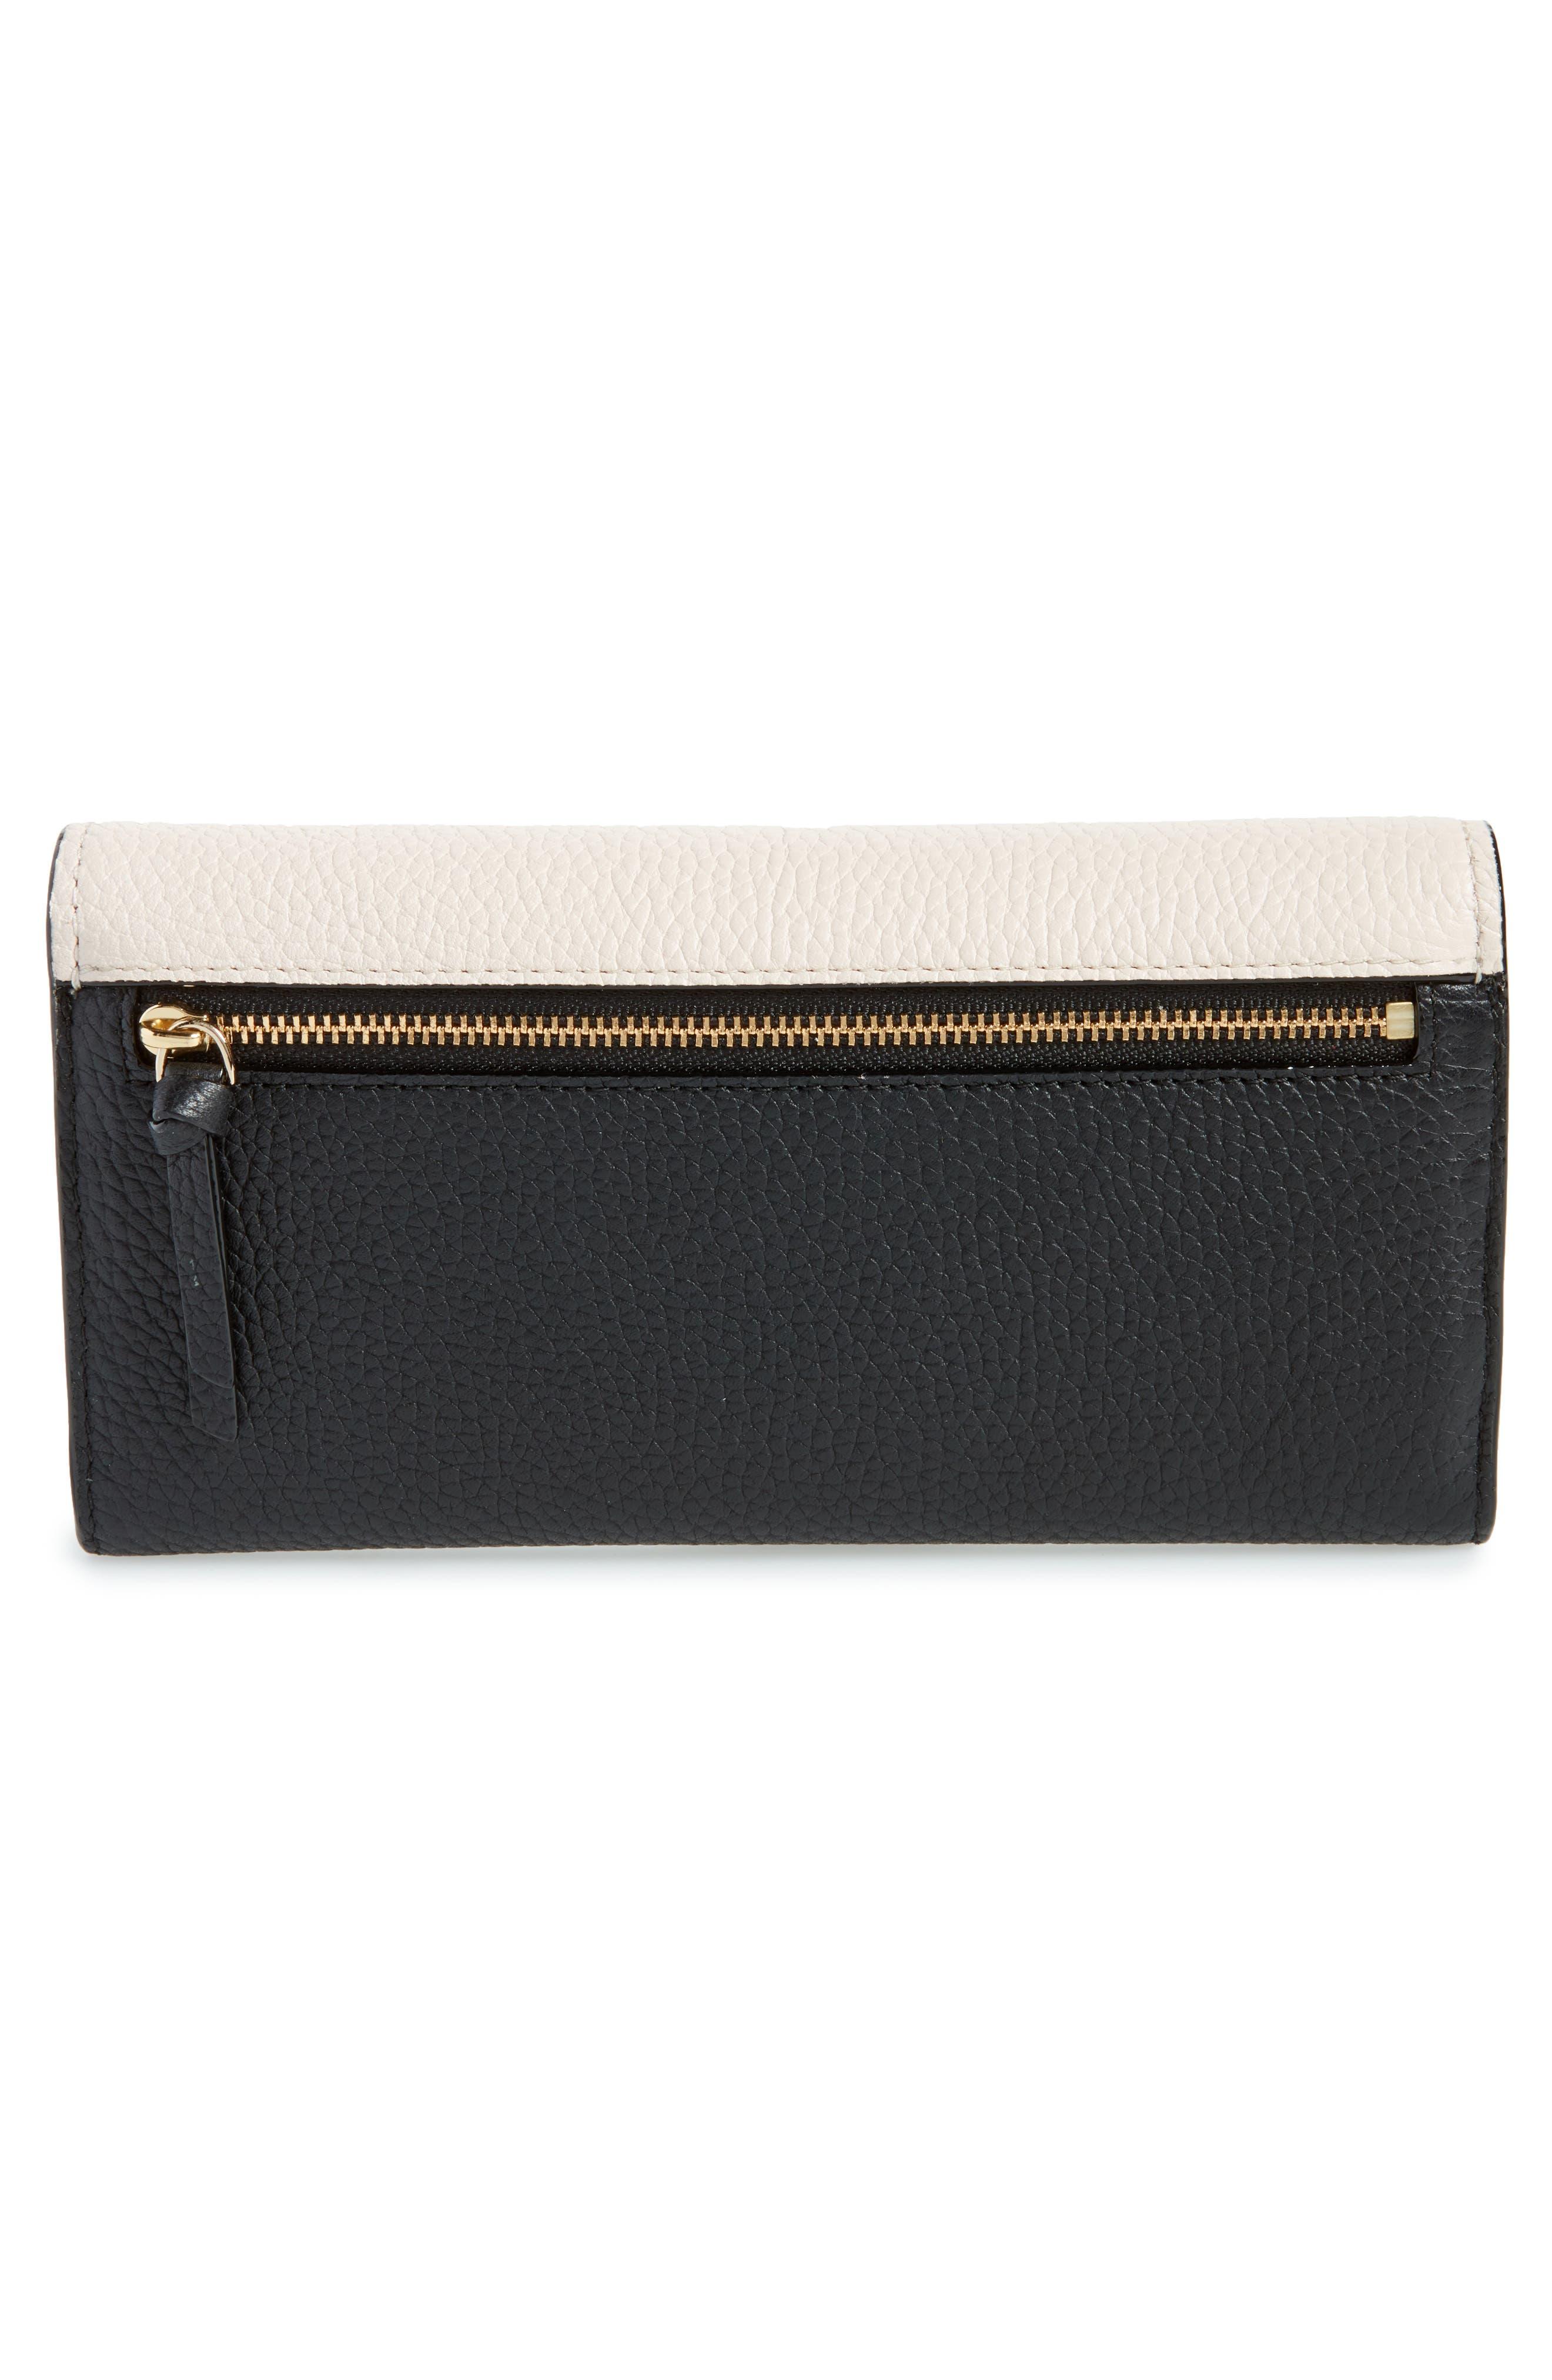 jackson street - kinsley leather wallet,                             Alternate thumbnail 4, color,                             Black/ Bleach Bone